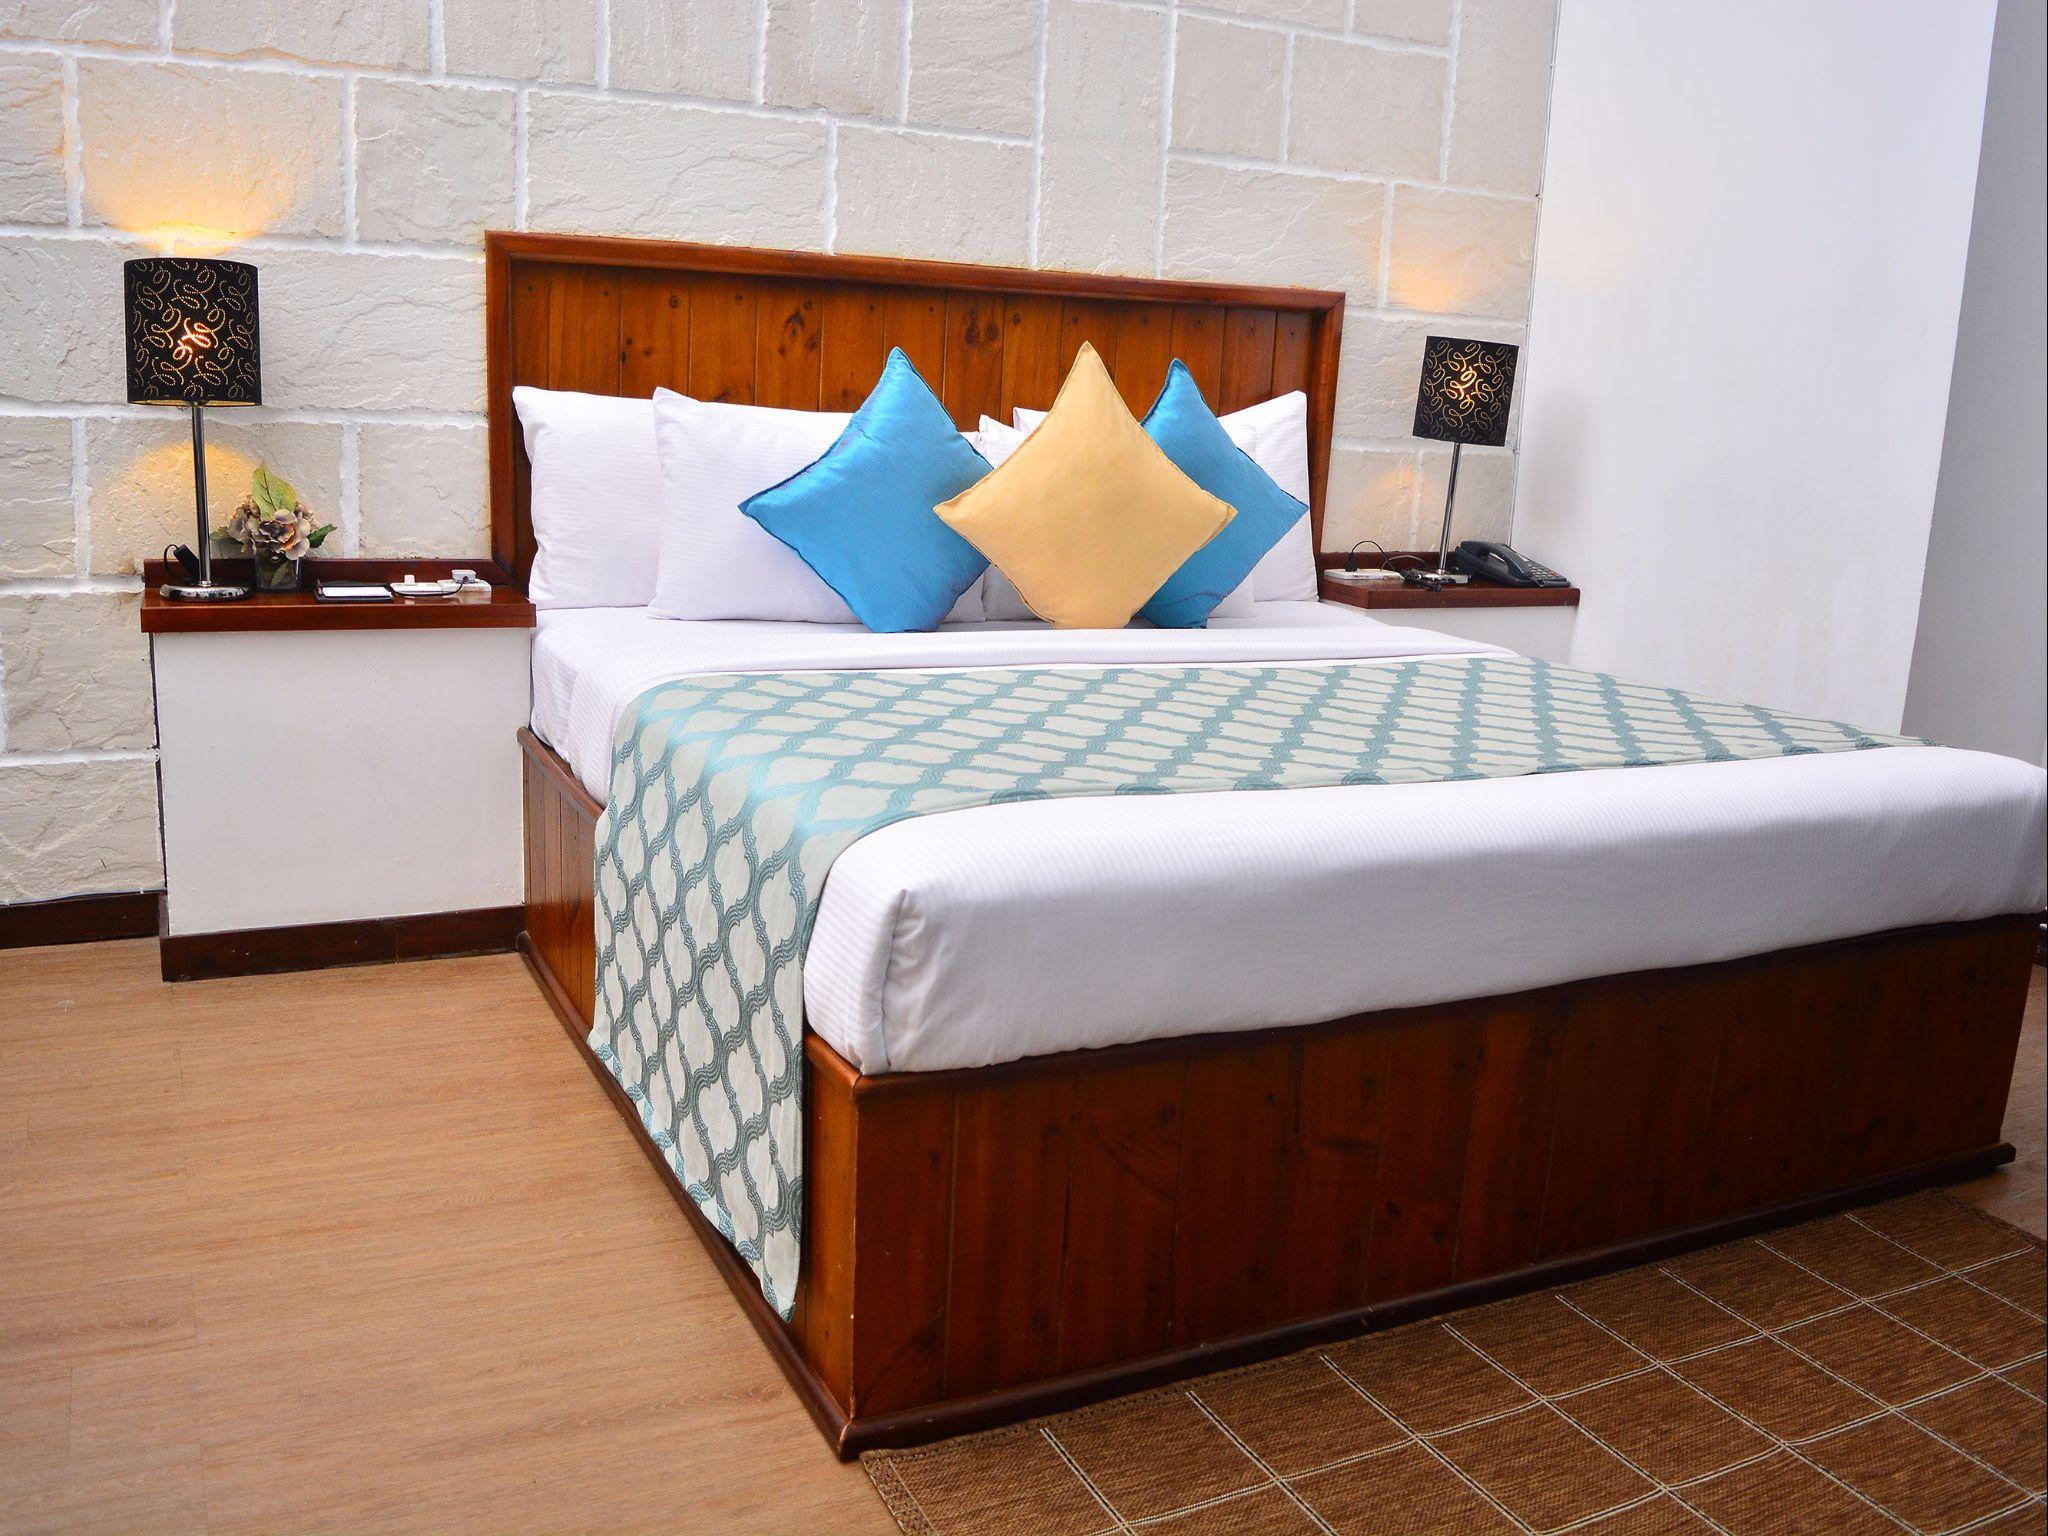 Hotel Damar Emas House 16 - Jalan Raya Padonan, Gang Pondok Asri no. 99X, Canggu - Bali